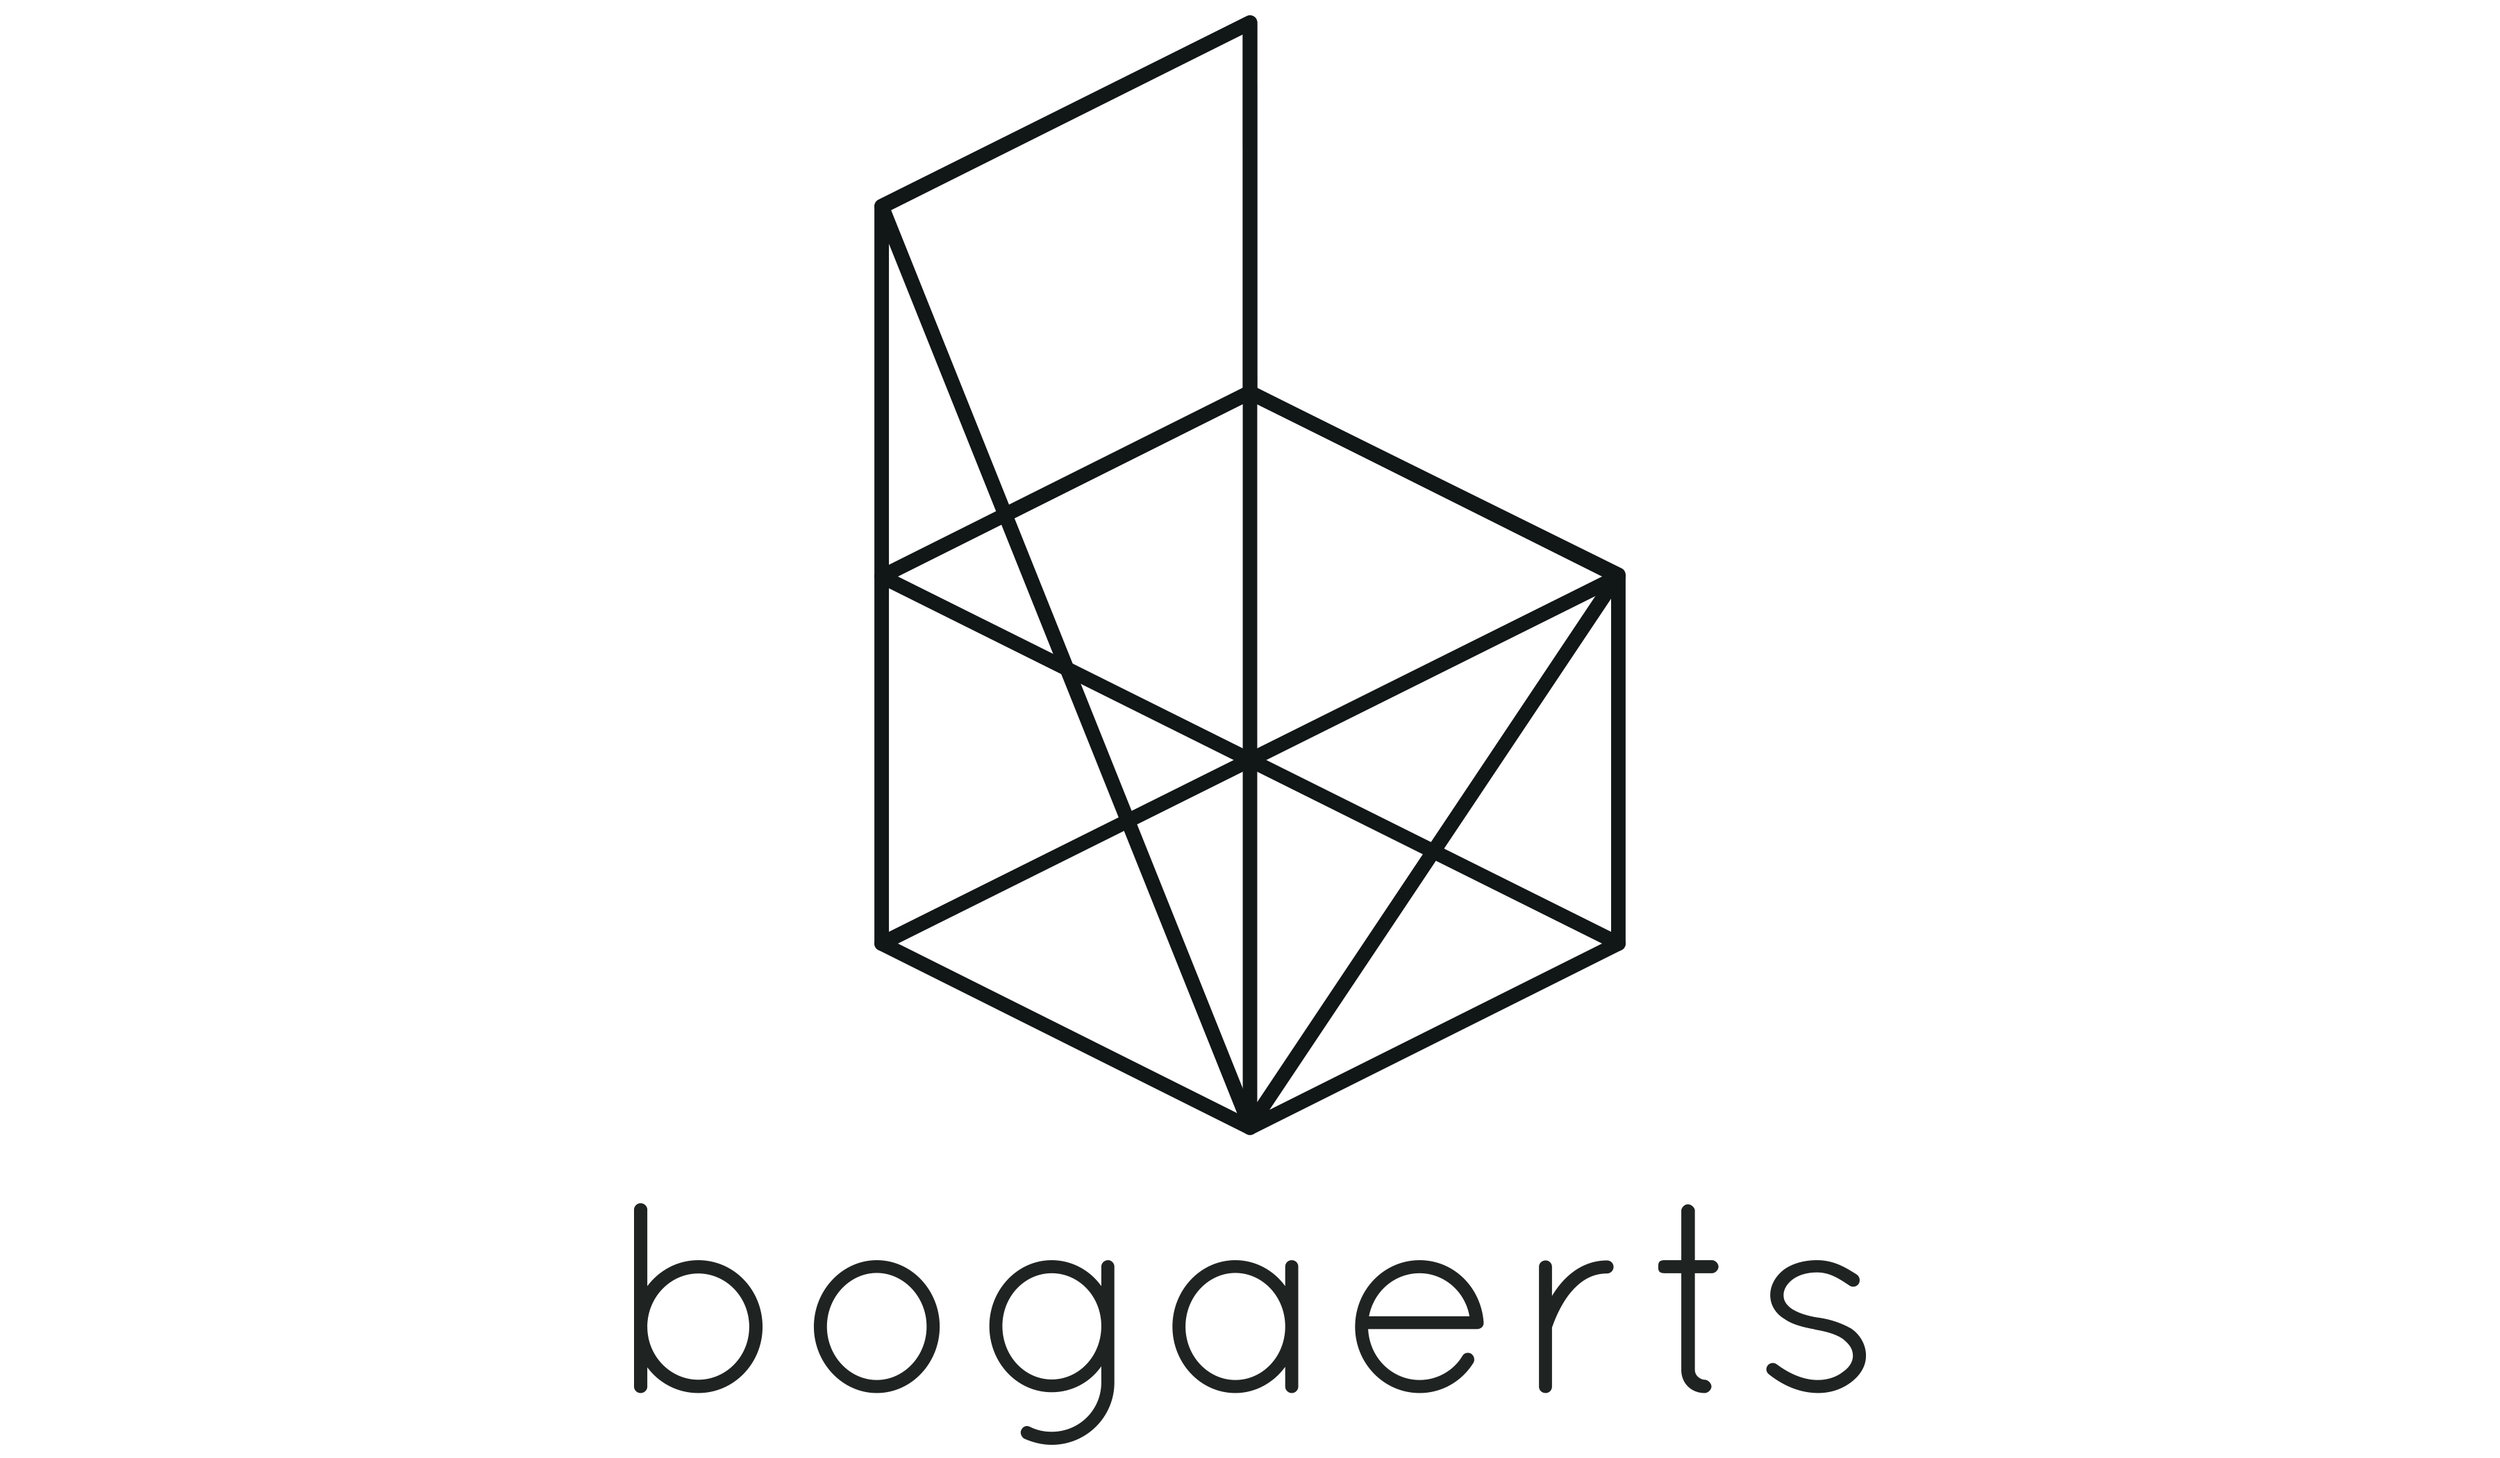 Logo_bogaerts_wireframe_12x7.jpg